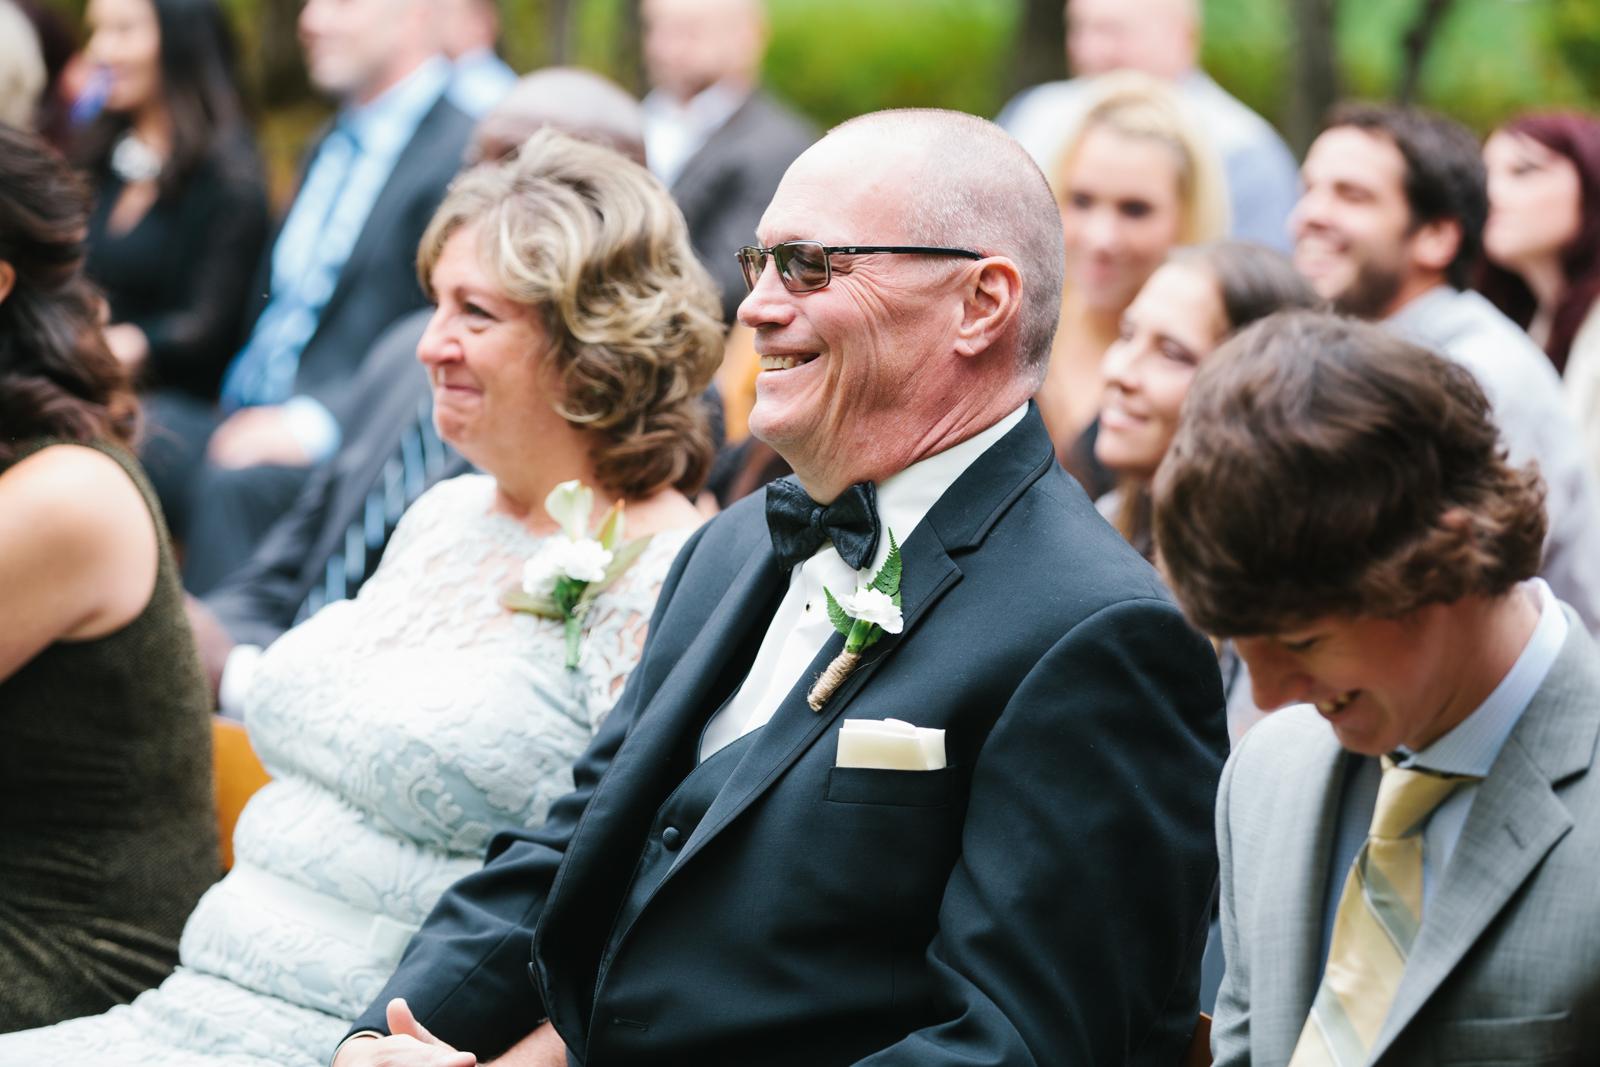 Glimmerstone-Mansion-Vermont-Wedding-Photography-Amanda-Morgan-61.jpg